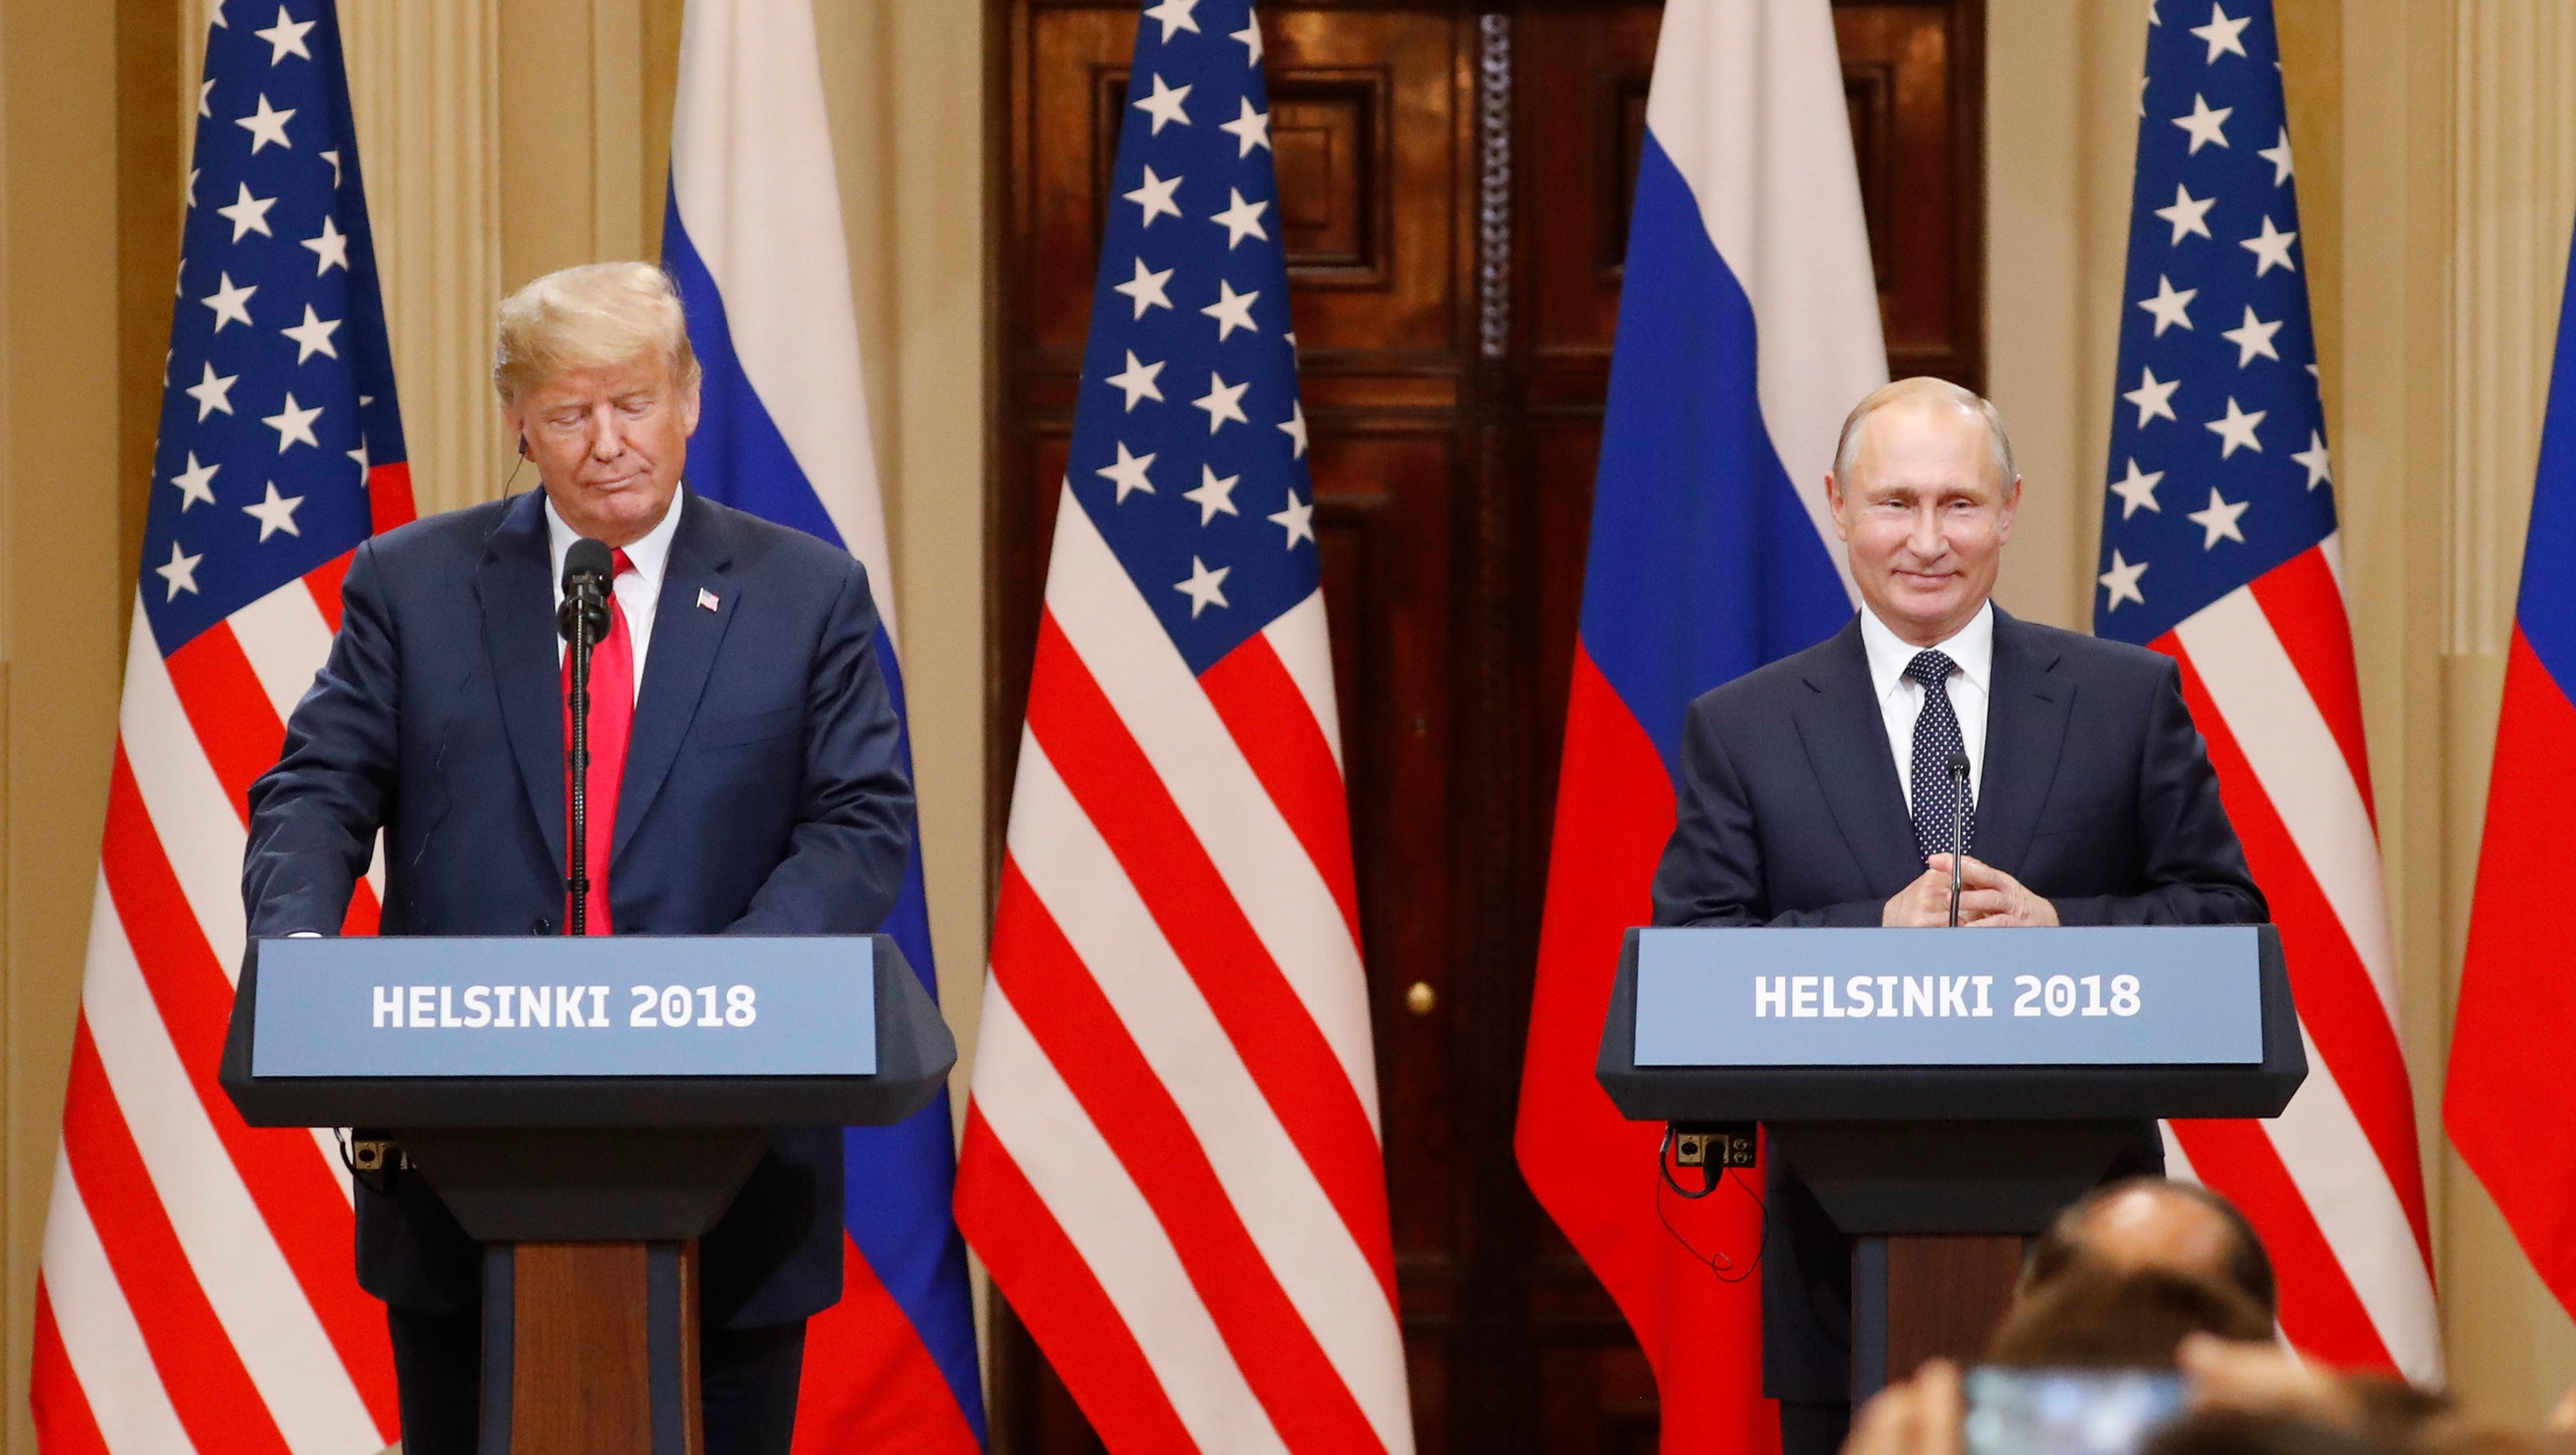 usatoday.com - John Fritze and Gregory Korte and David Jackson, USA TODAY - Republican senators blast Trump meeting with Putin as 'shameful' and 'sign of weakness'